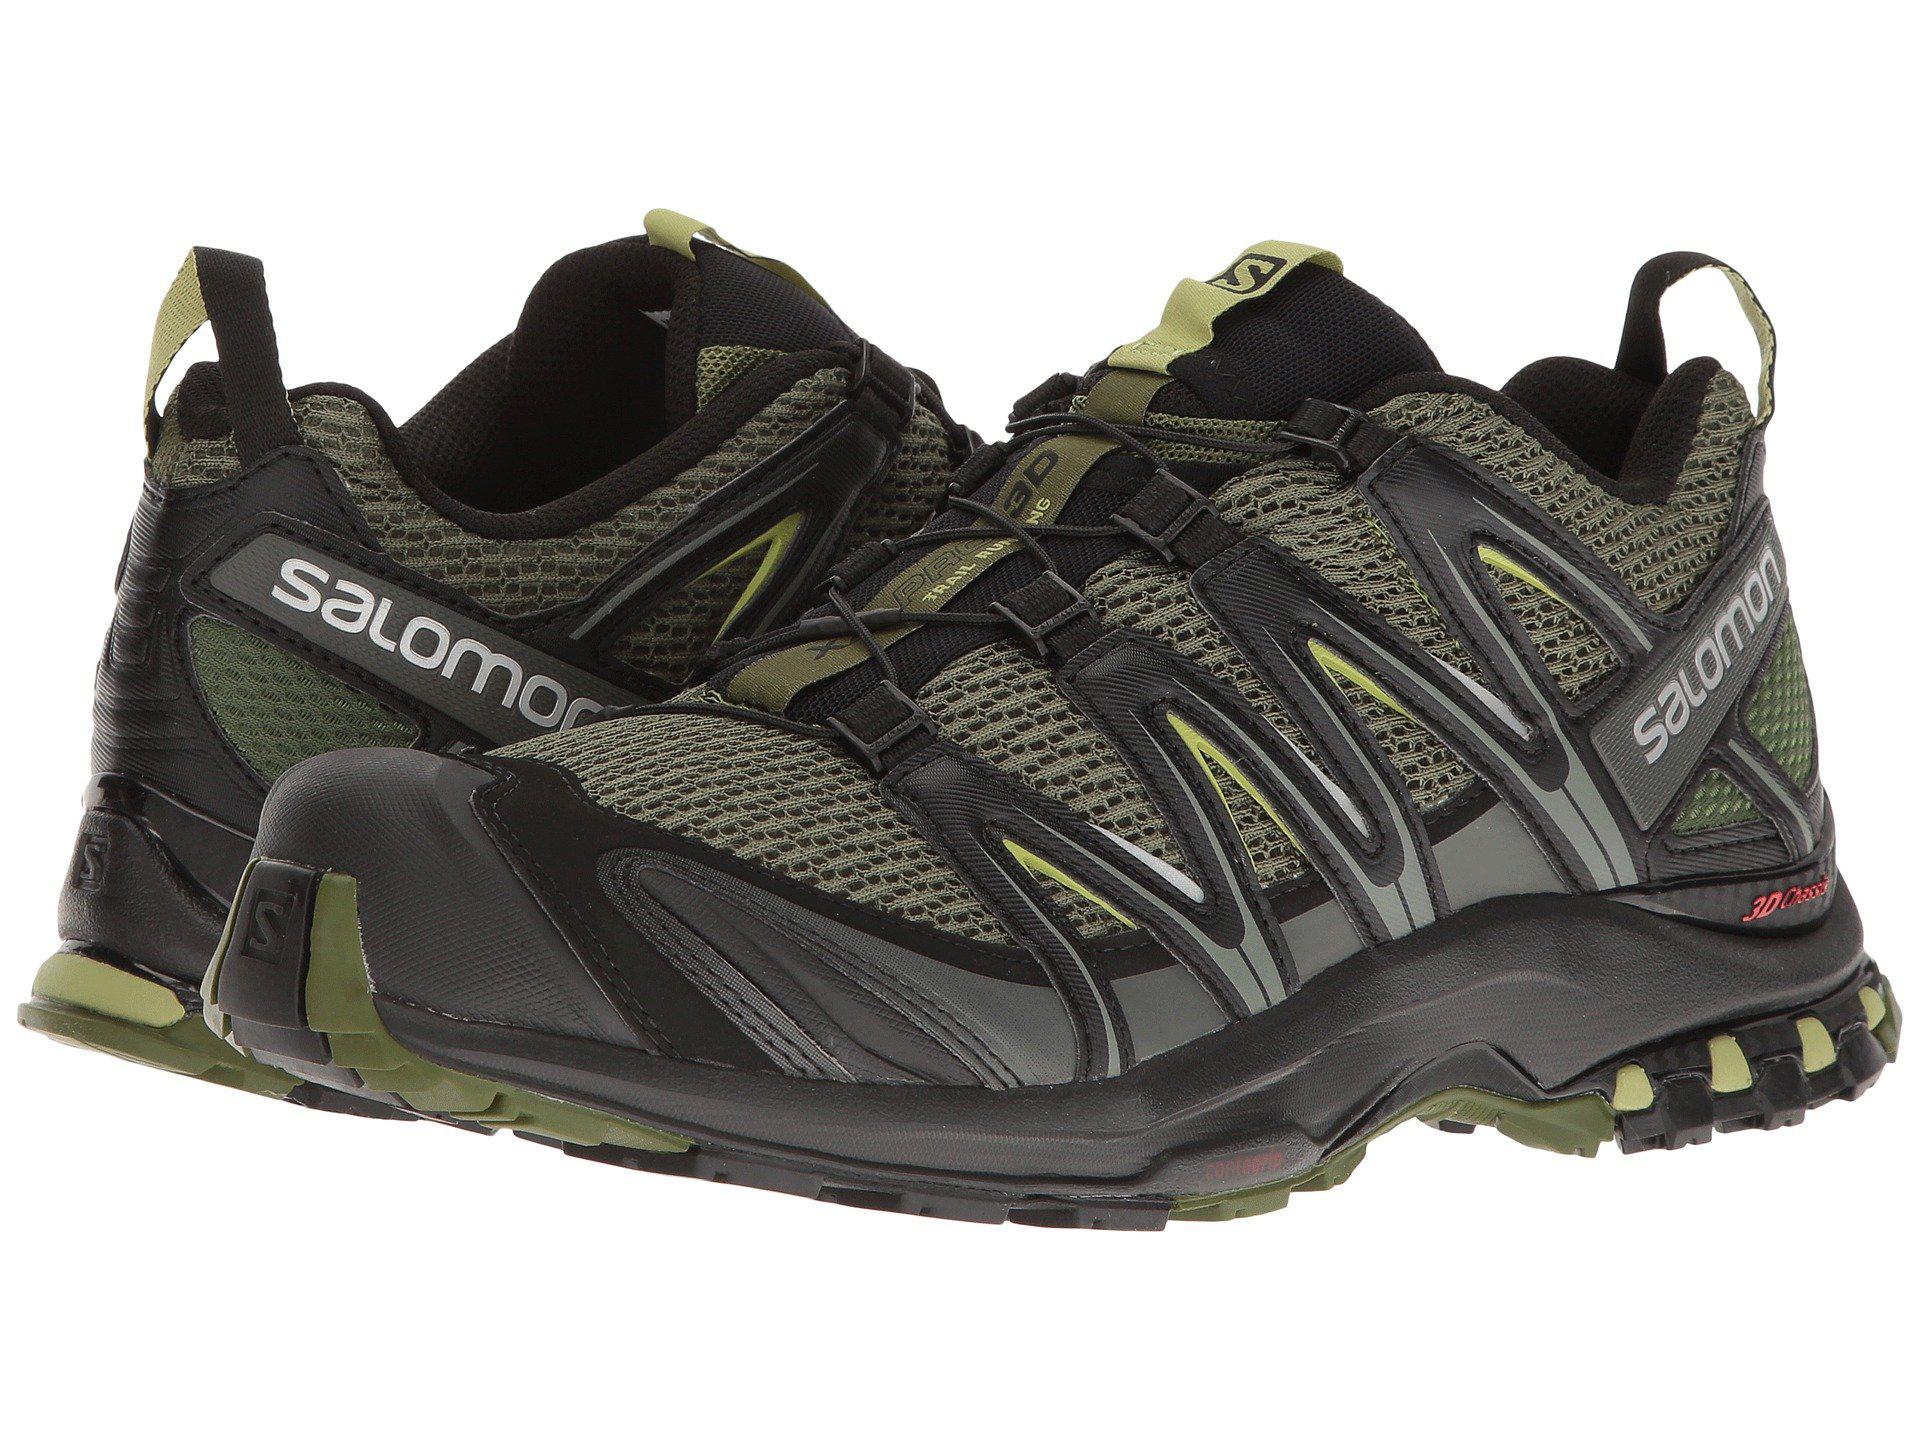 d9389241c Lyst - Yves Salomon Xa Pro 3d (chive black beluga) Men s Shoes in ...